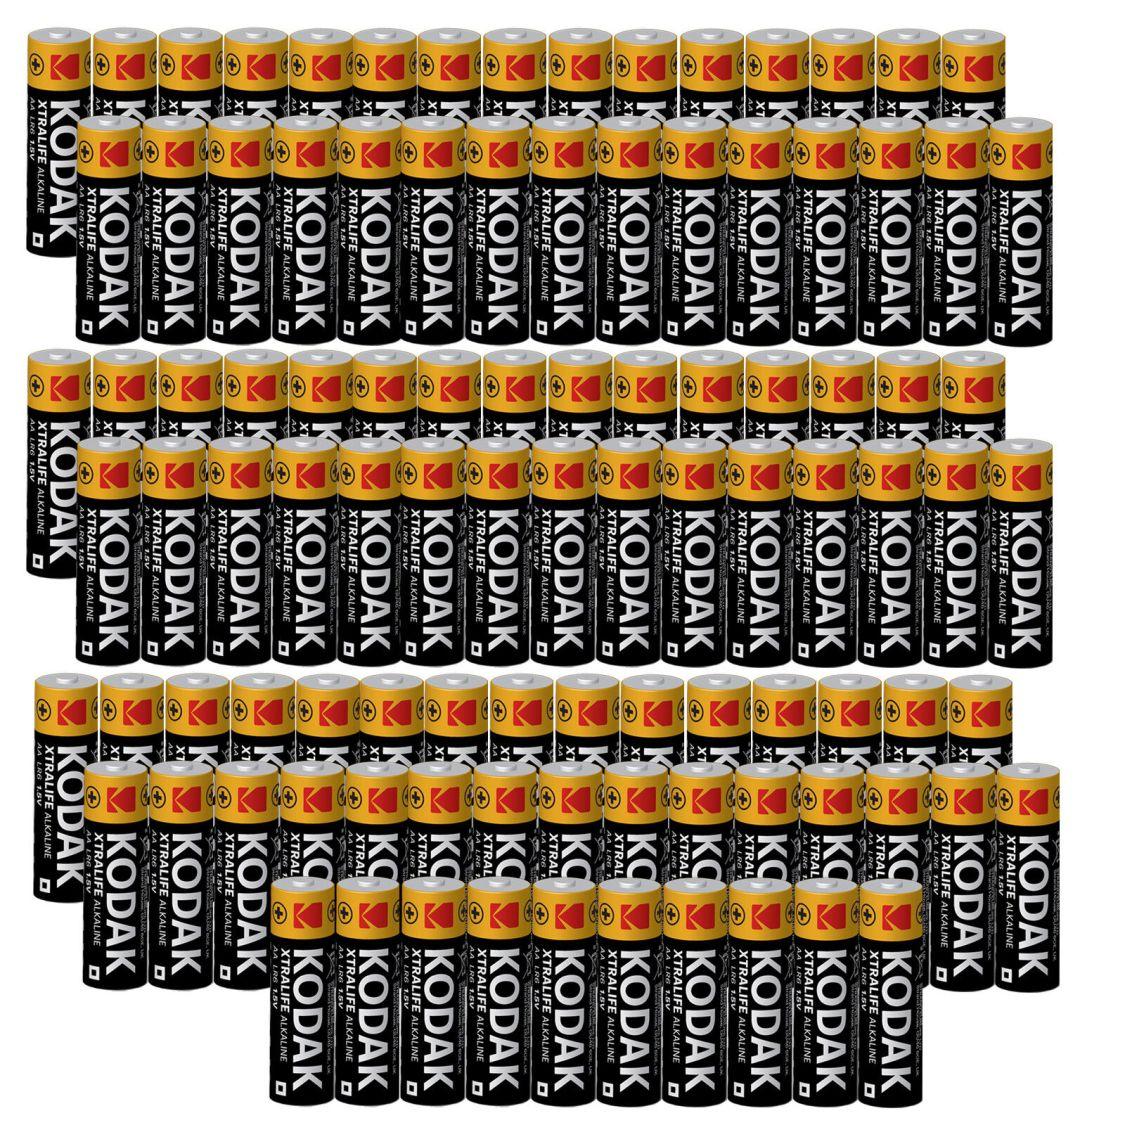 100 x KODAK Mignon AA Batterien 2700 mAh 1,5 V LR06 Xtralife